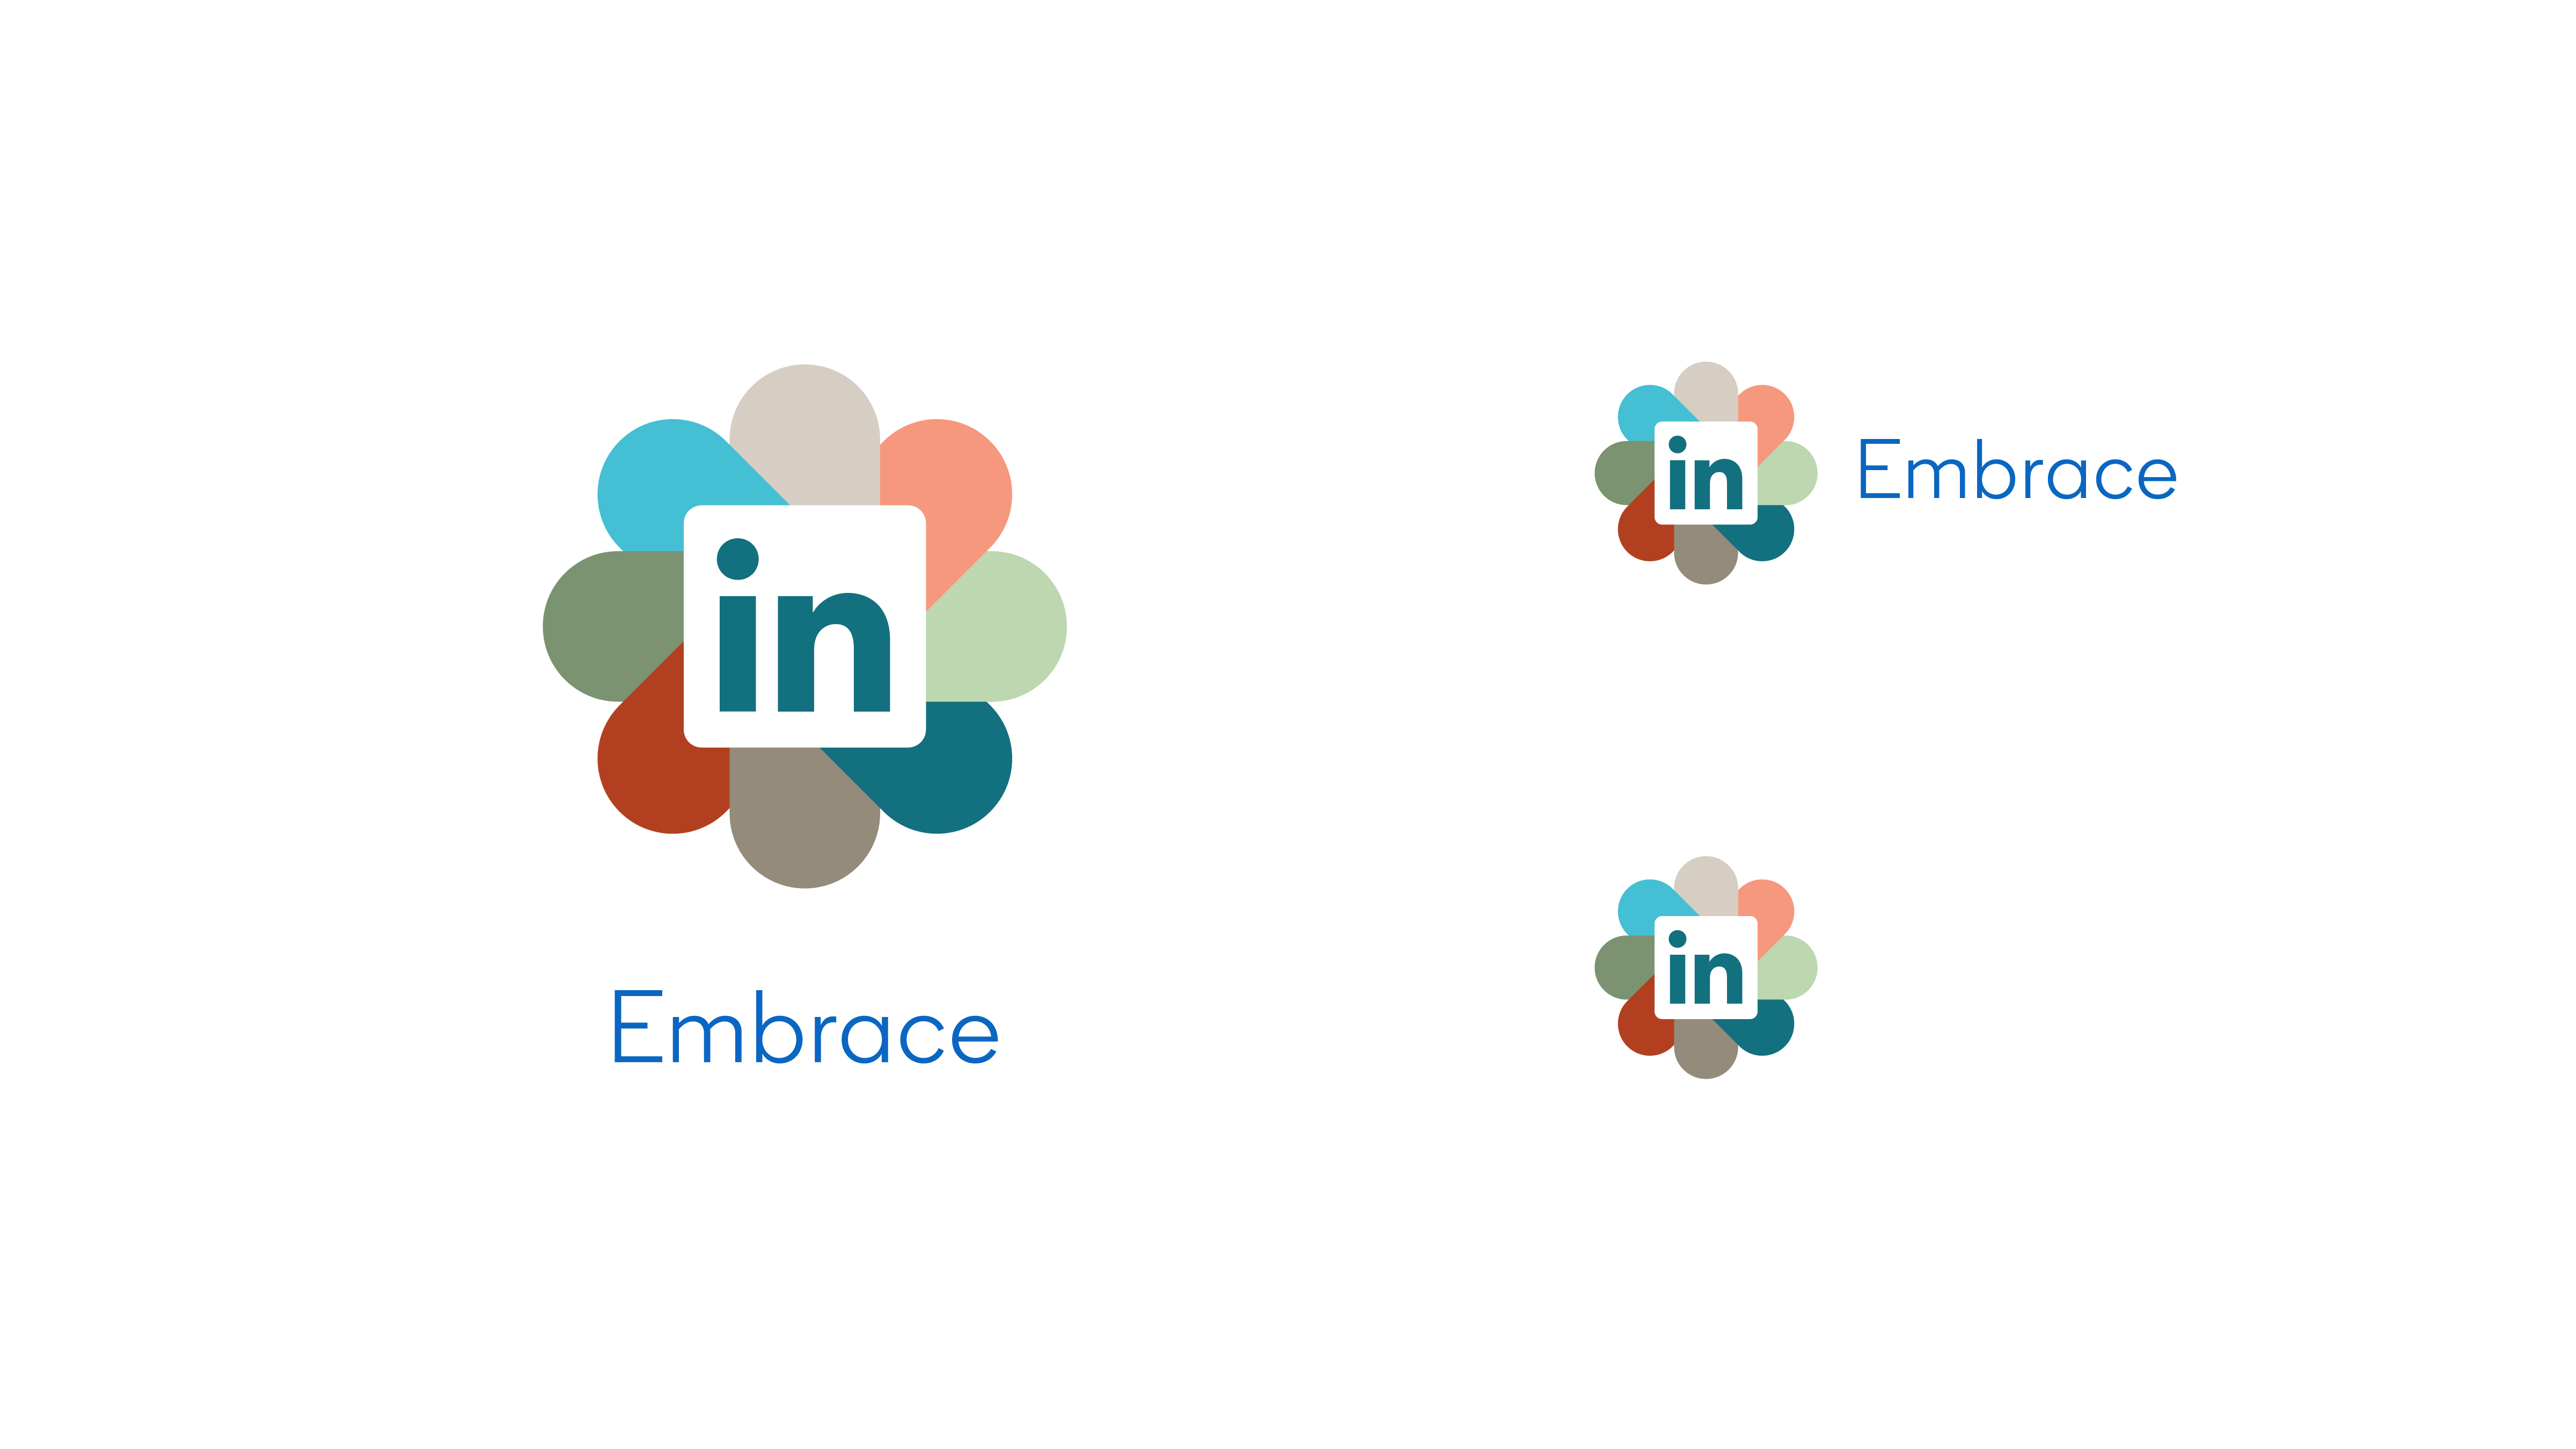 LinkedIn Employee Resource Group Embrace logo variations